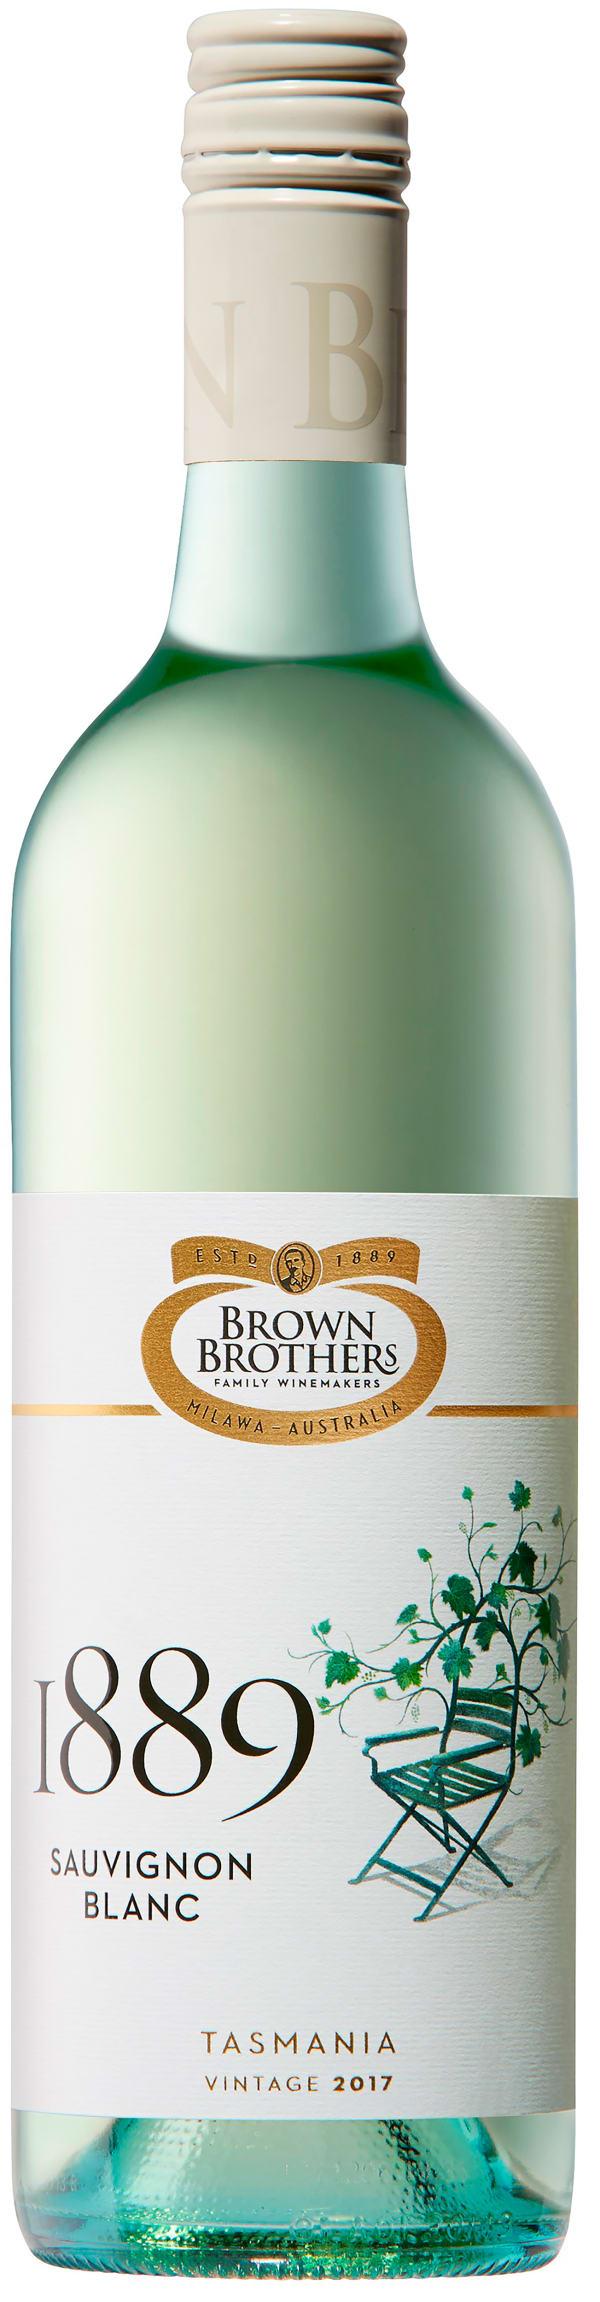 Brown Brothers 1889 Sauvignon Blanc 2017